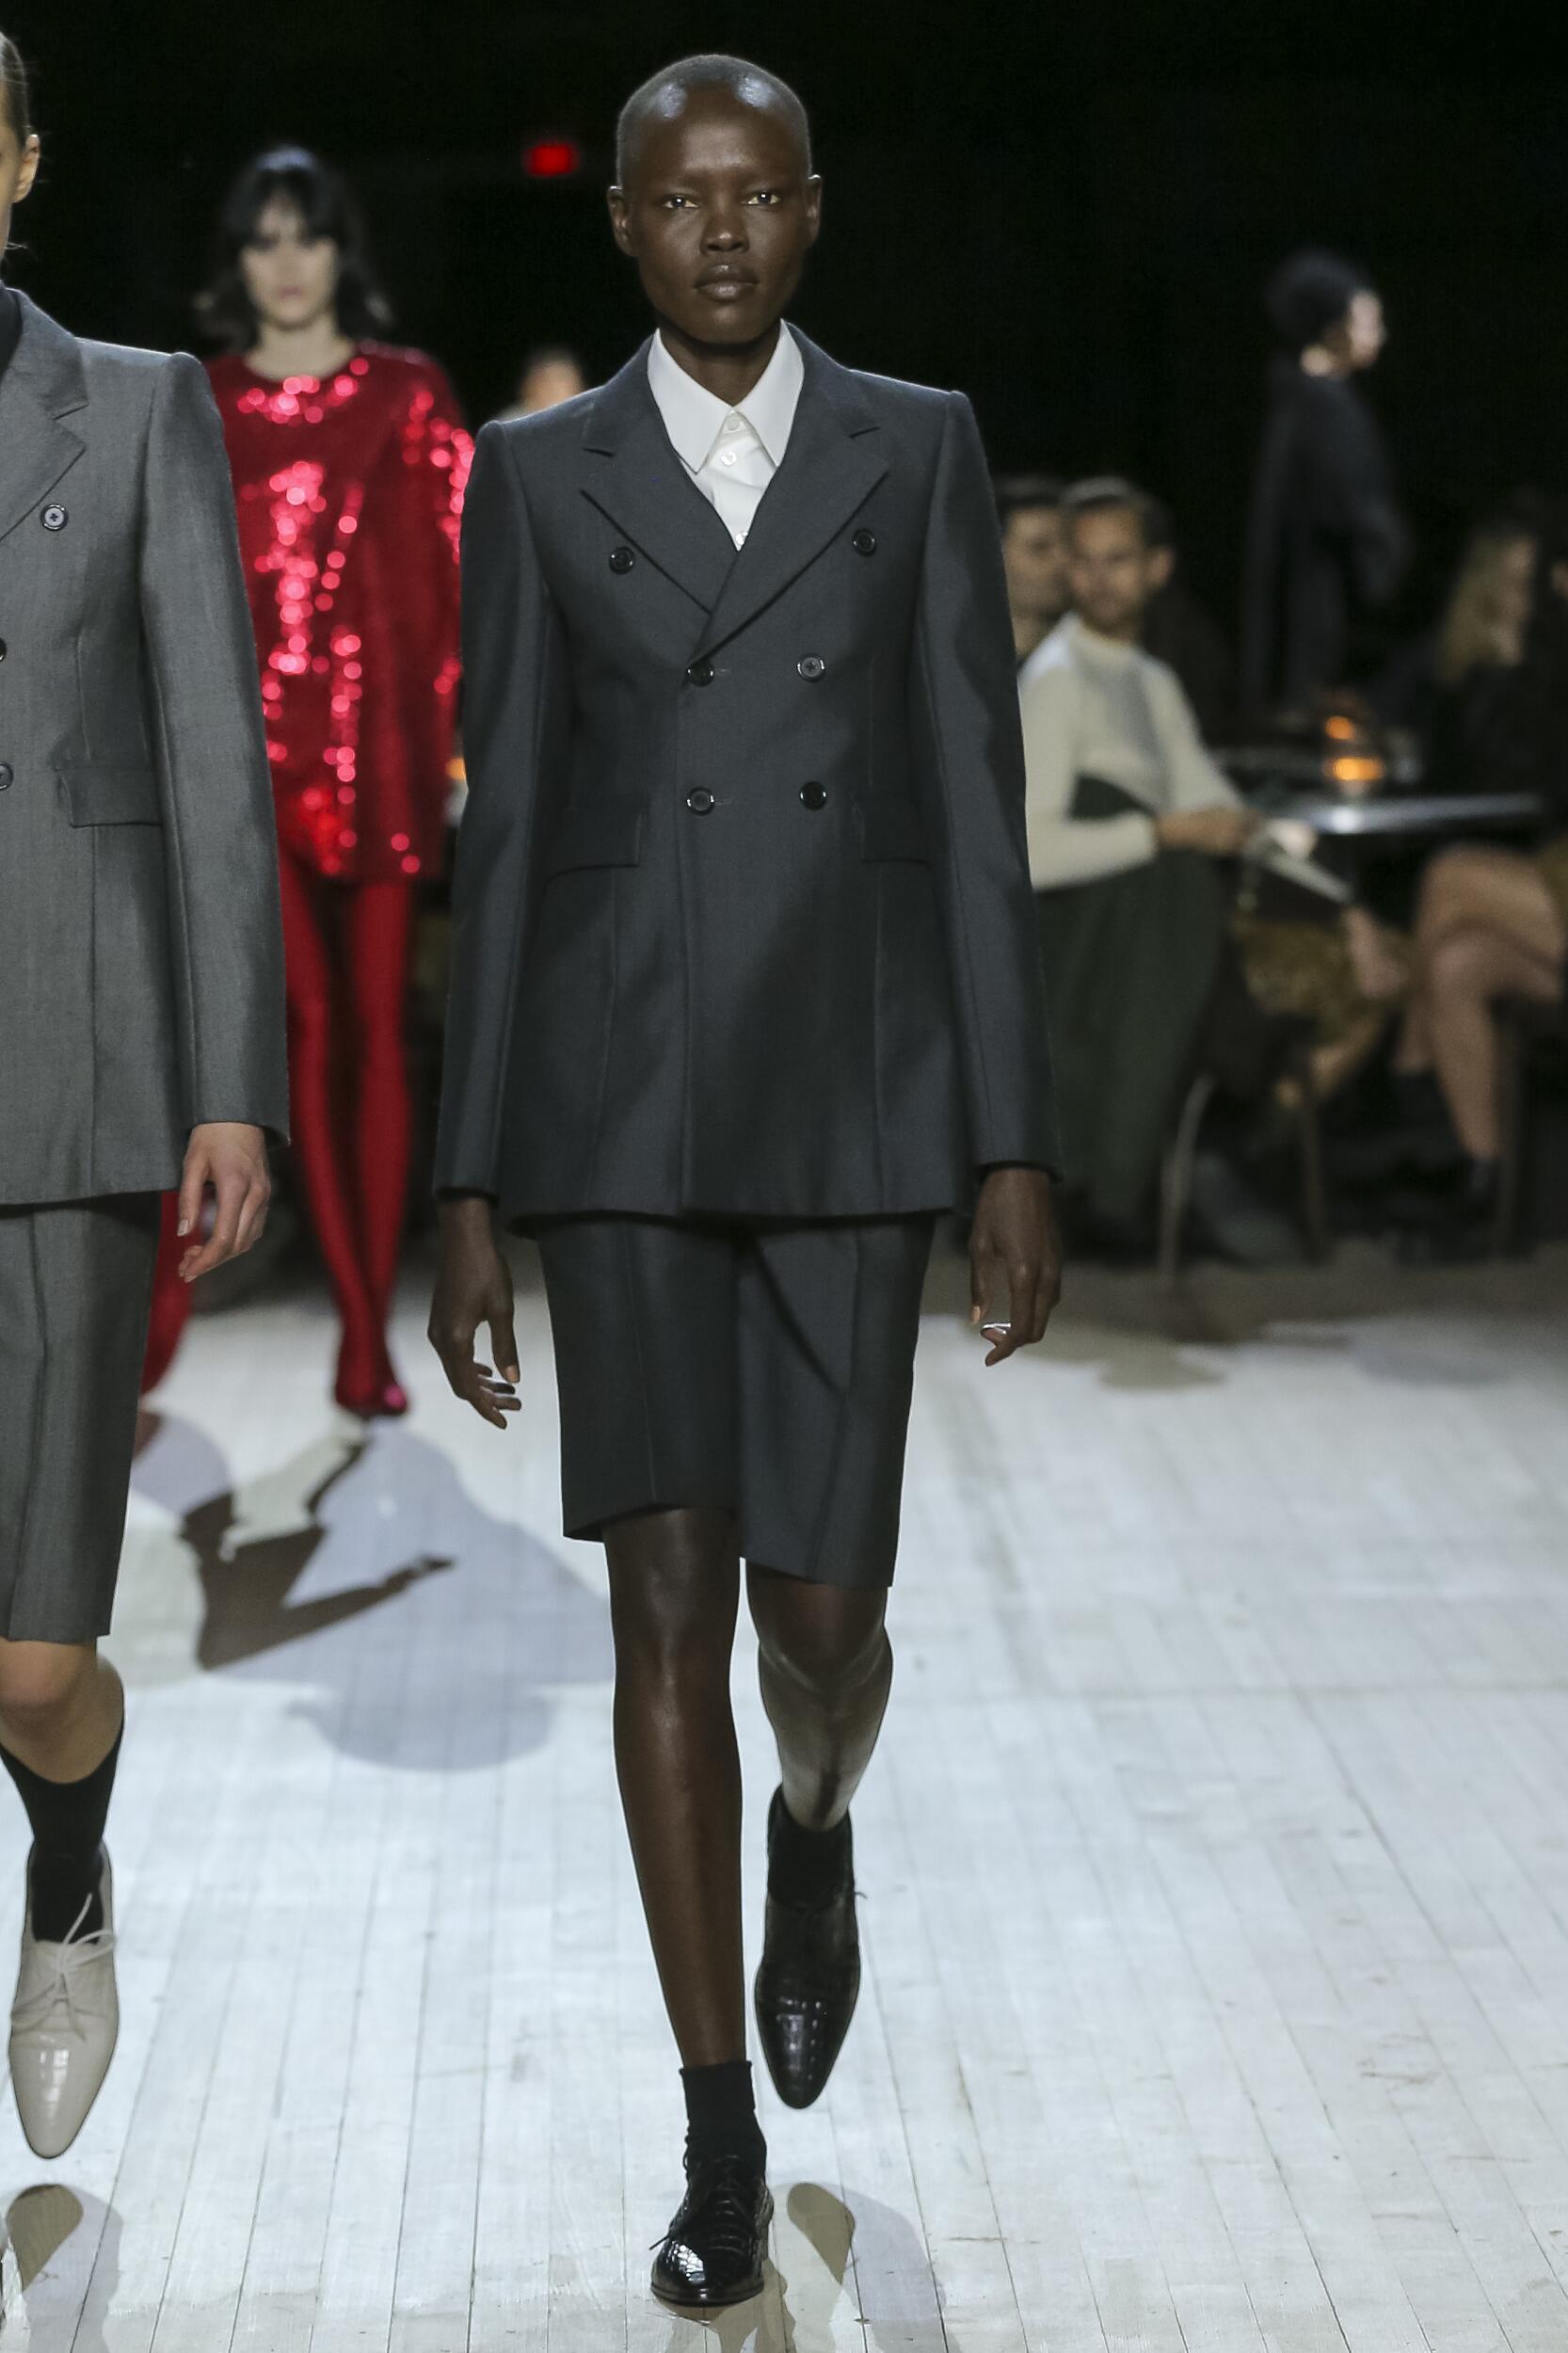 Catwalk Marc Jacobs Woman Fashion Show Winter 2020